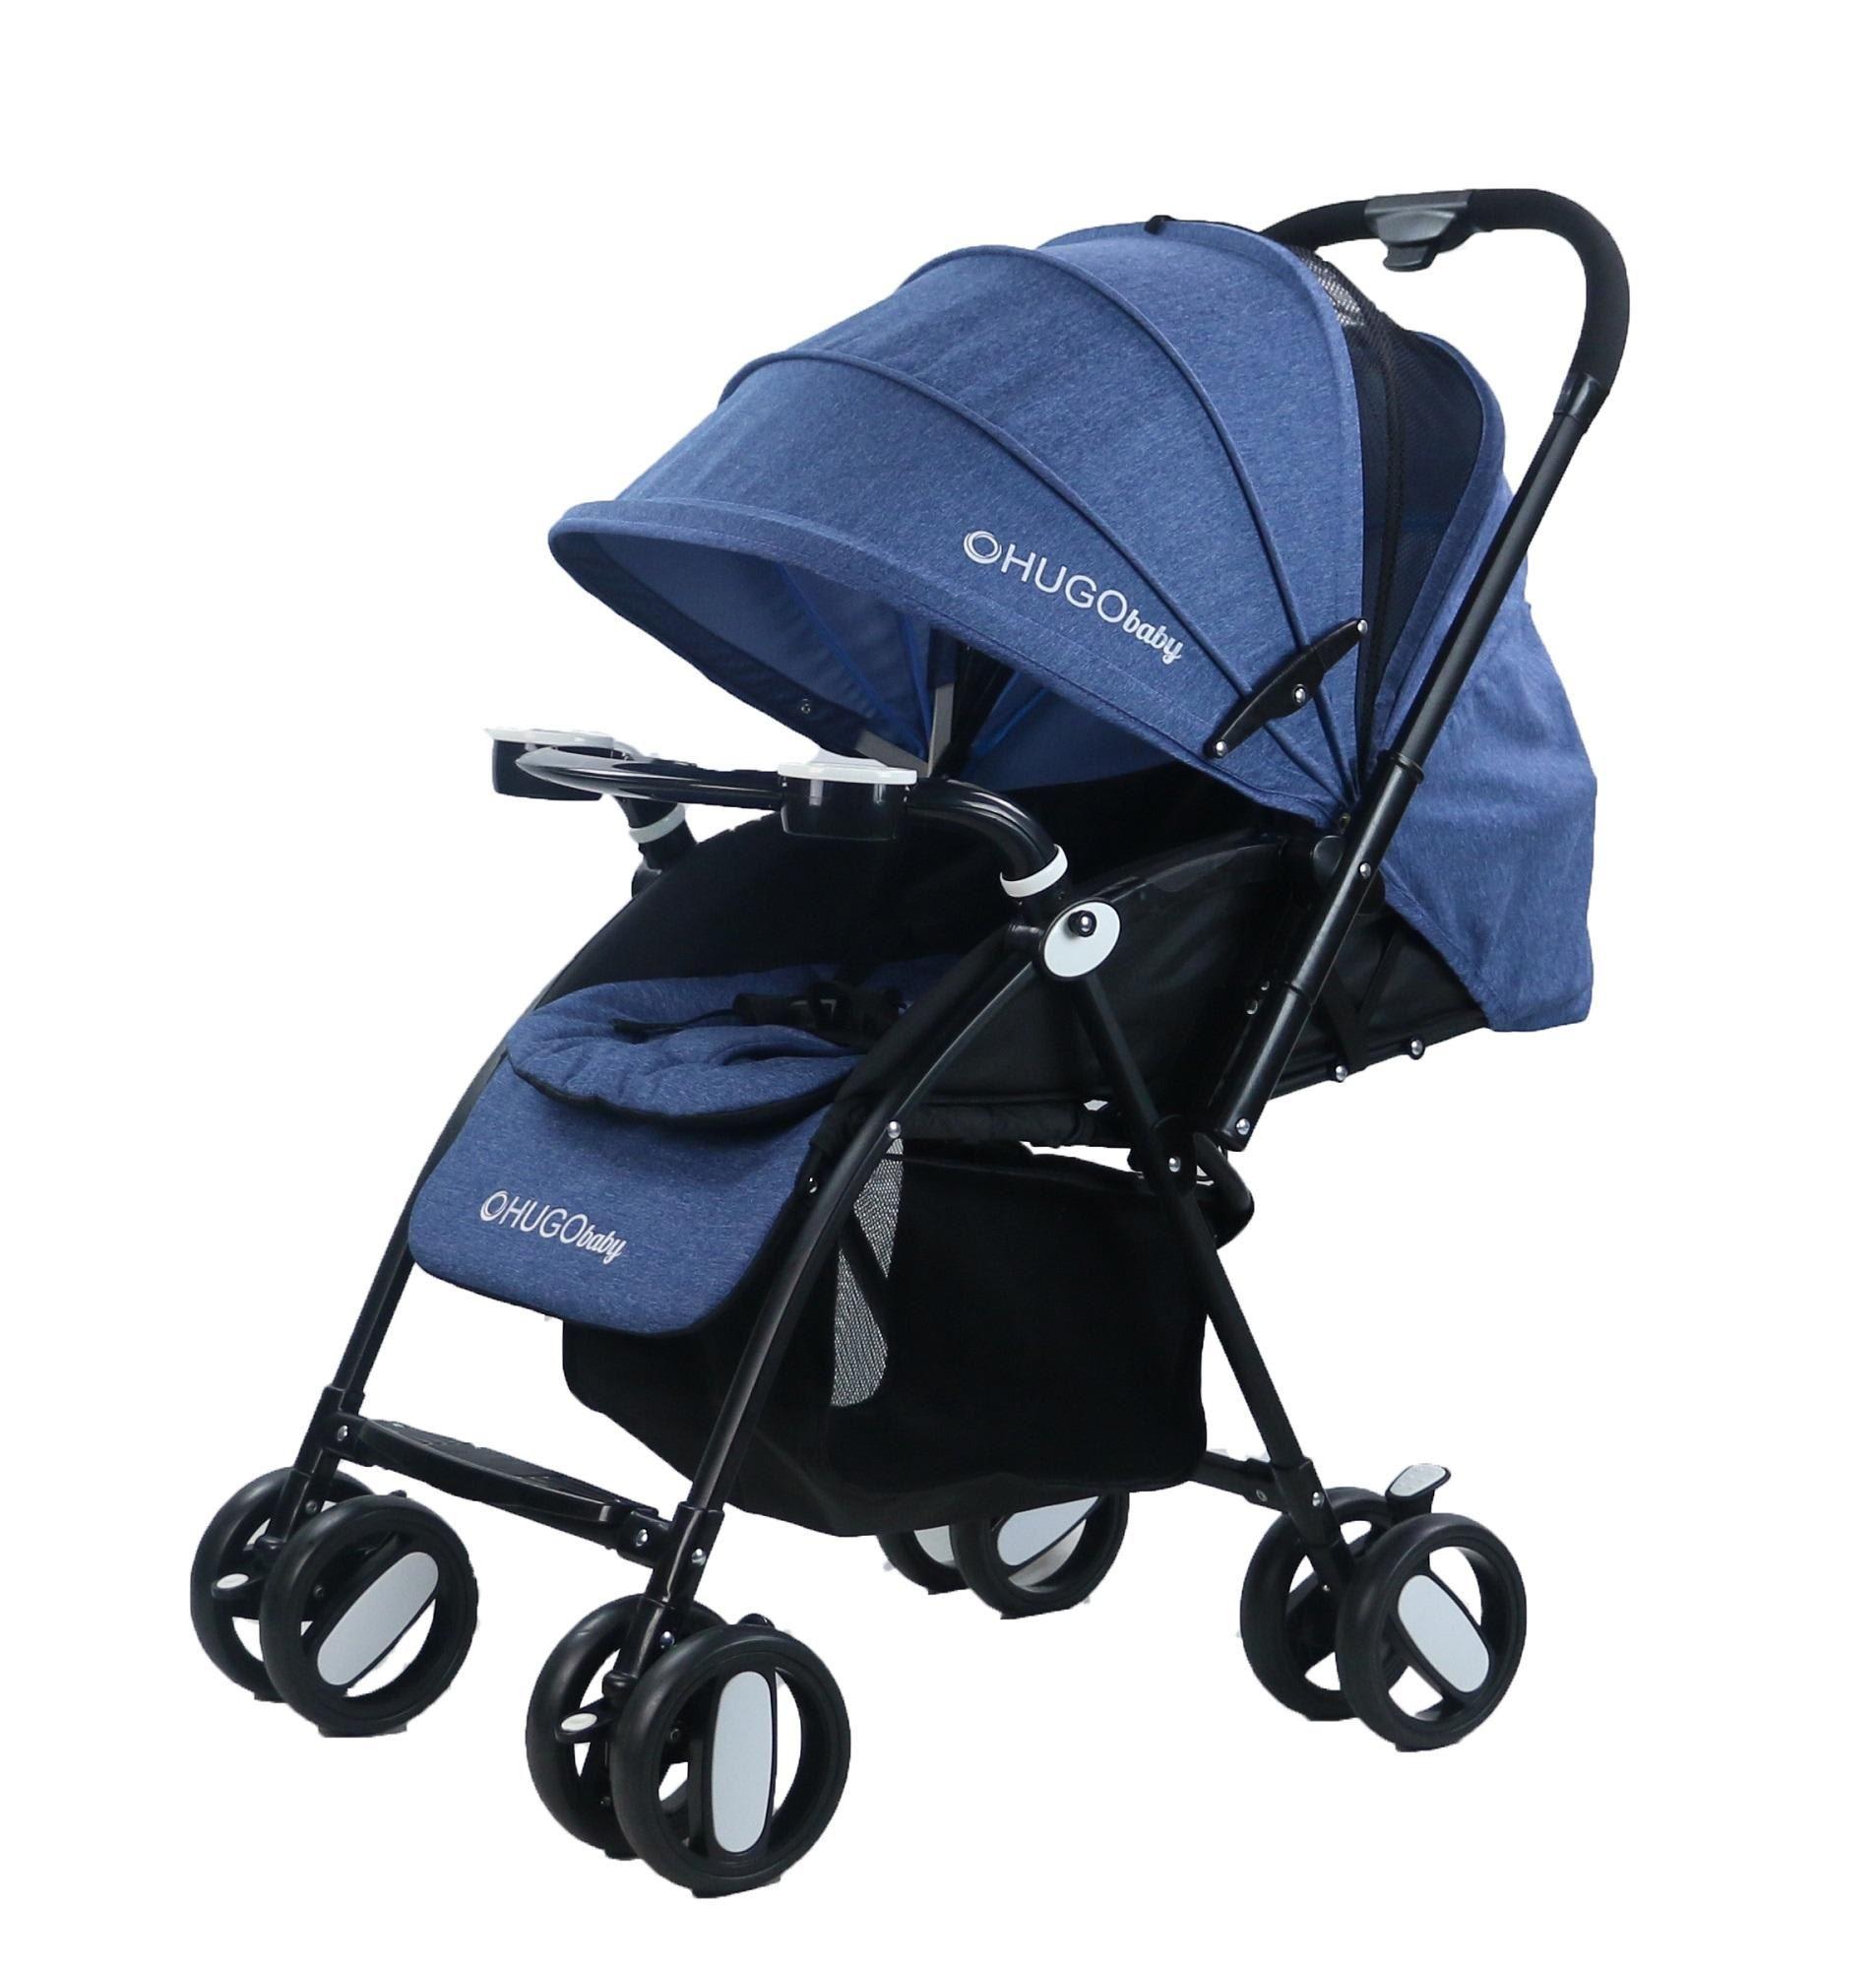 Hugo Baby Stroller in 2020 Baby strollers, Stroller